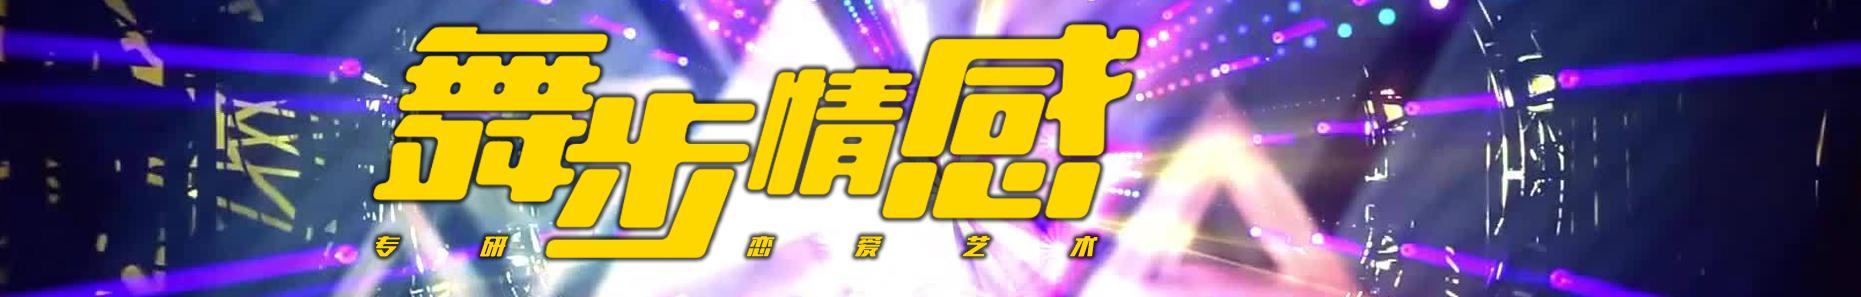 舞步情感恋爱 banner